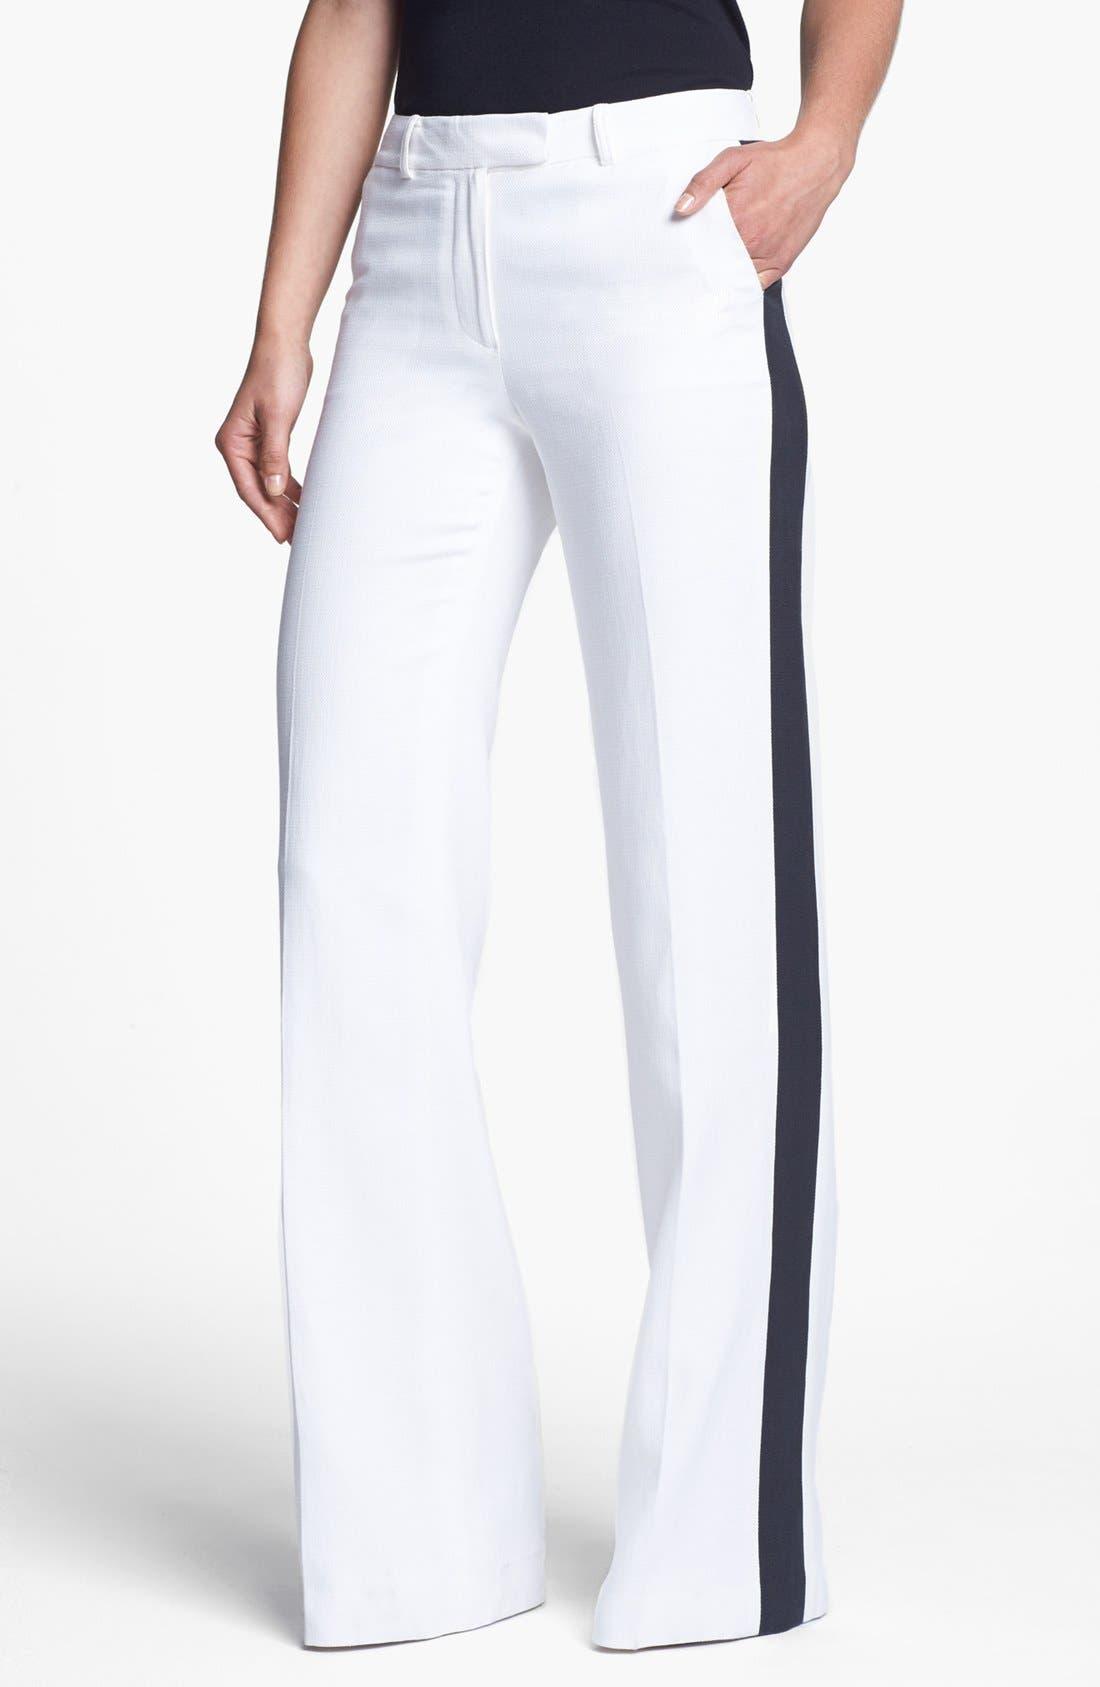 Alternate Image 1 Selected - Rachel Zoe 'Jett' Tuxedo Stripe Wide Leg Pants